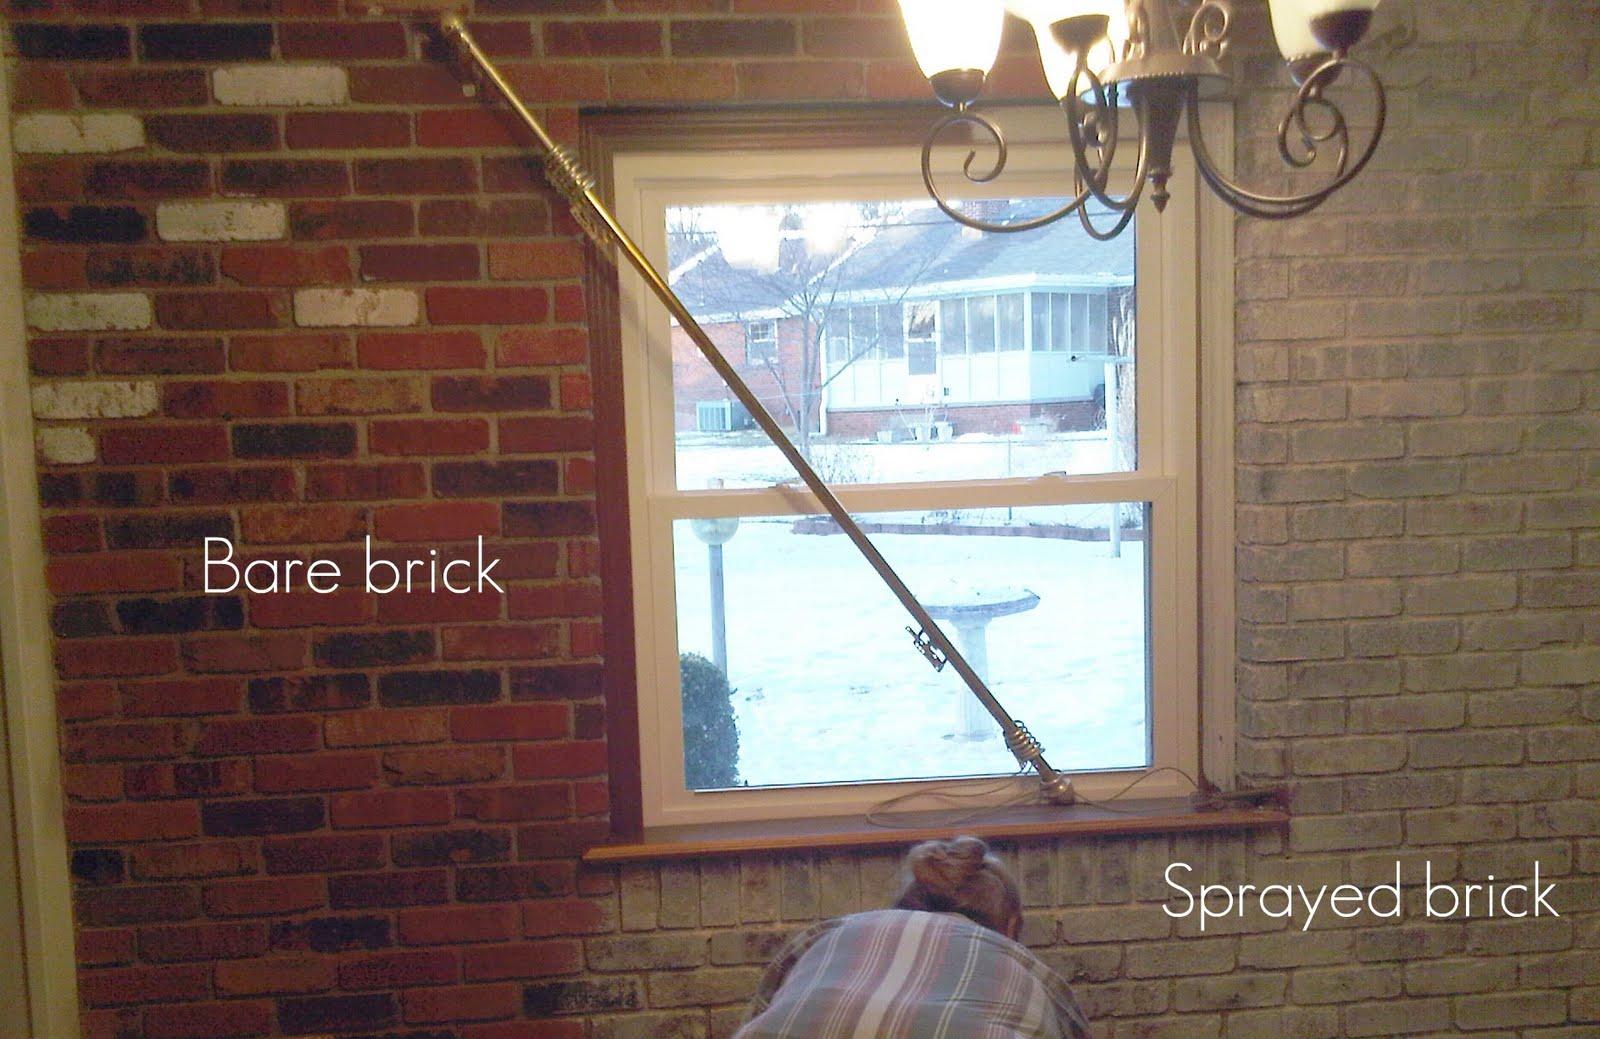 How to Spray Paint Brick Walls